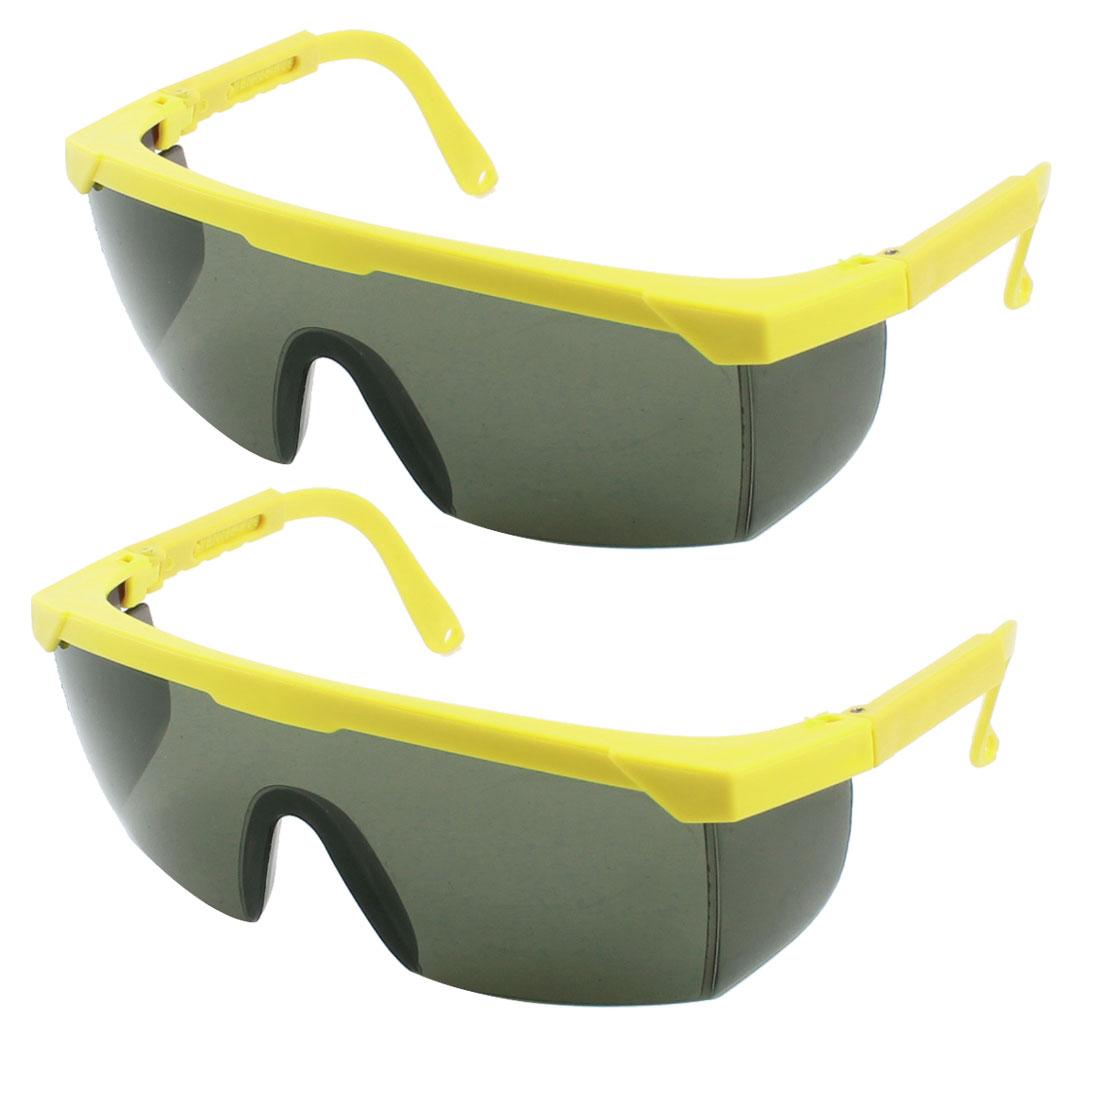 Yellow Adjustable Plastic Arms Protective Welding Glasses Eyewear 2pcs